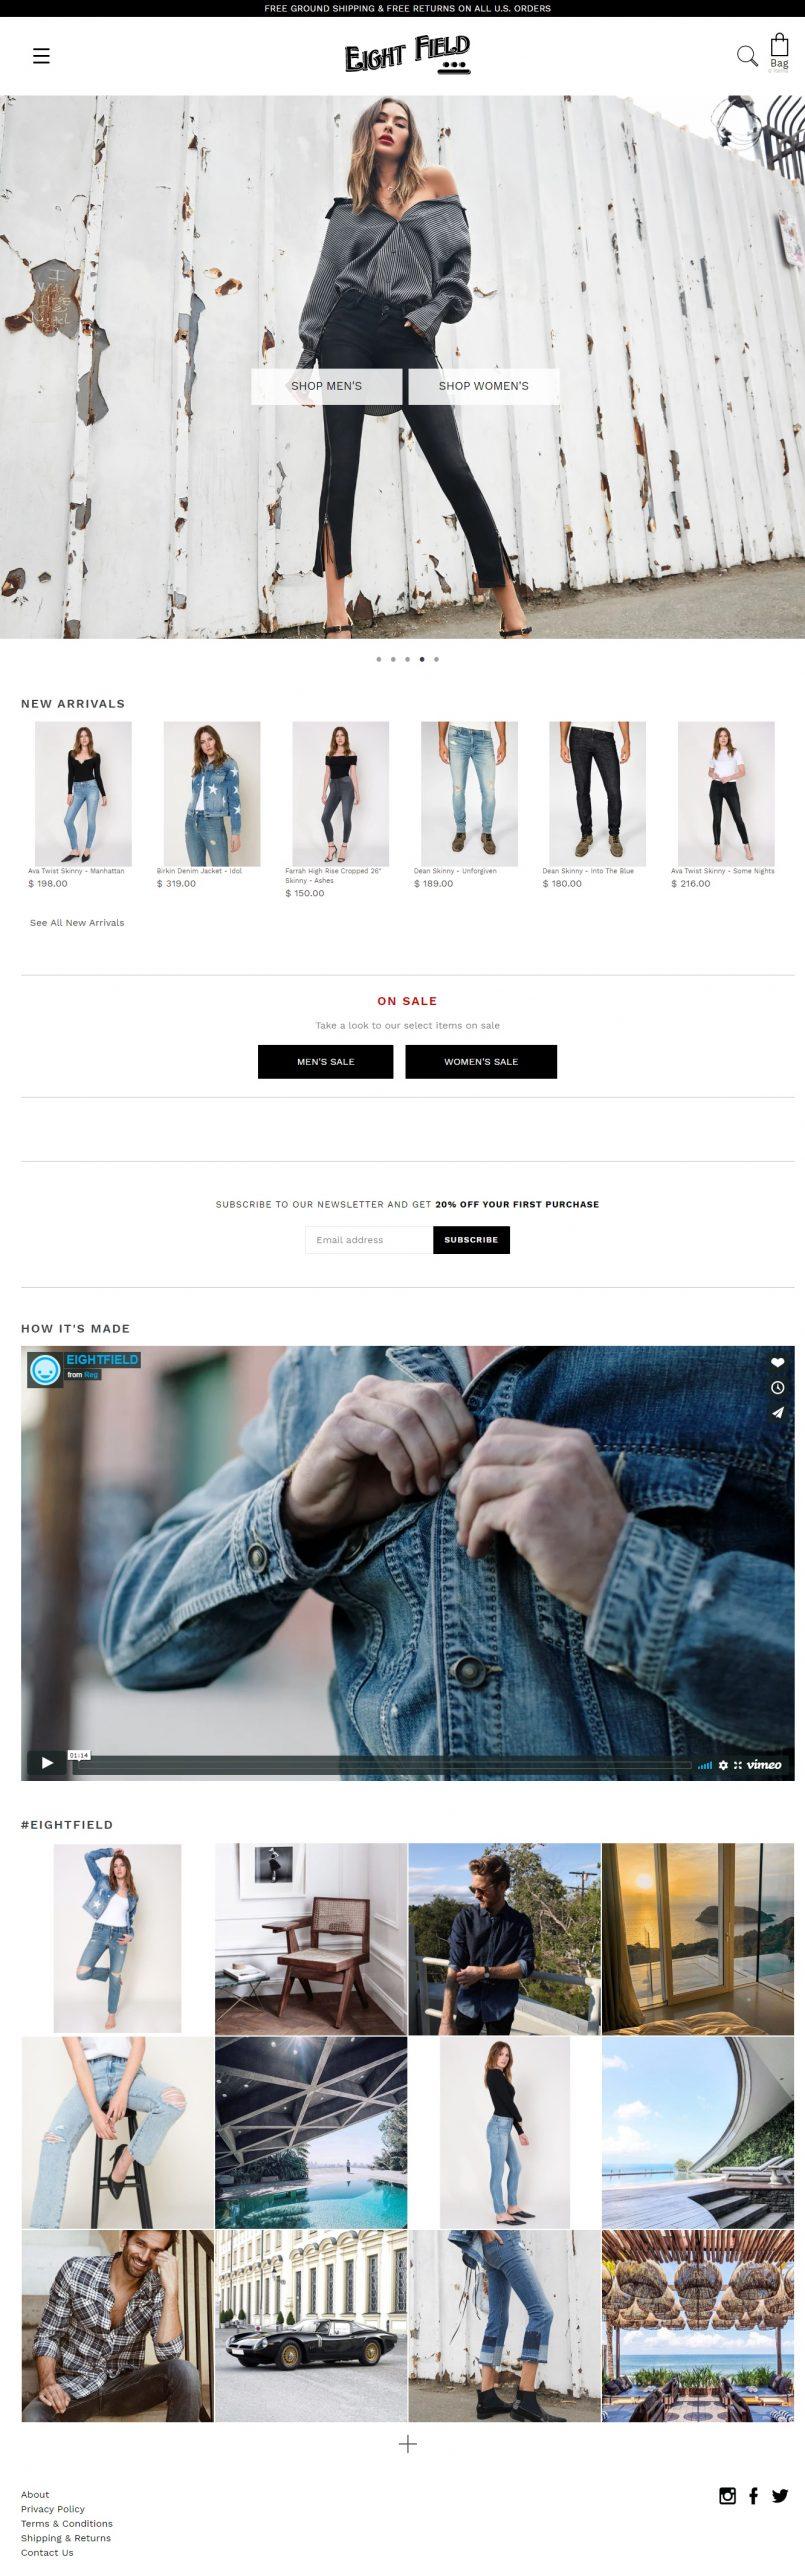 Eighfield Shopify Website